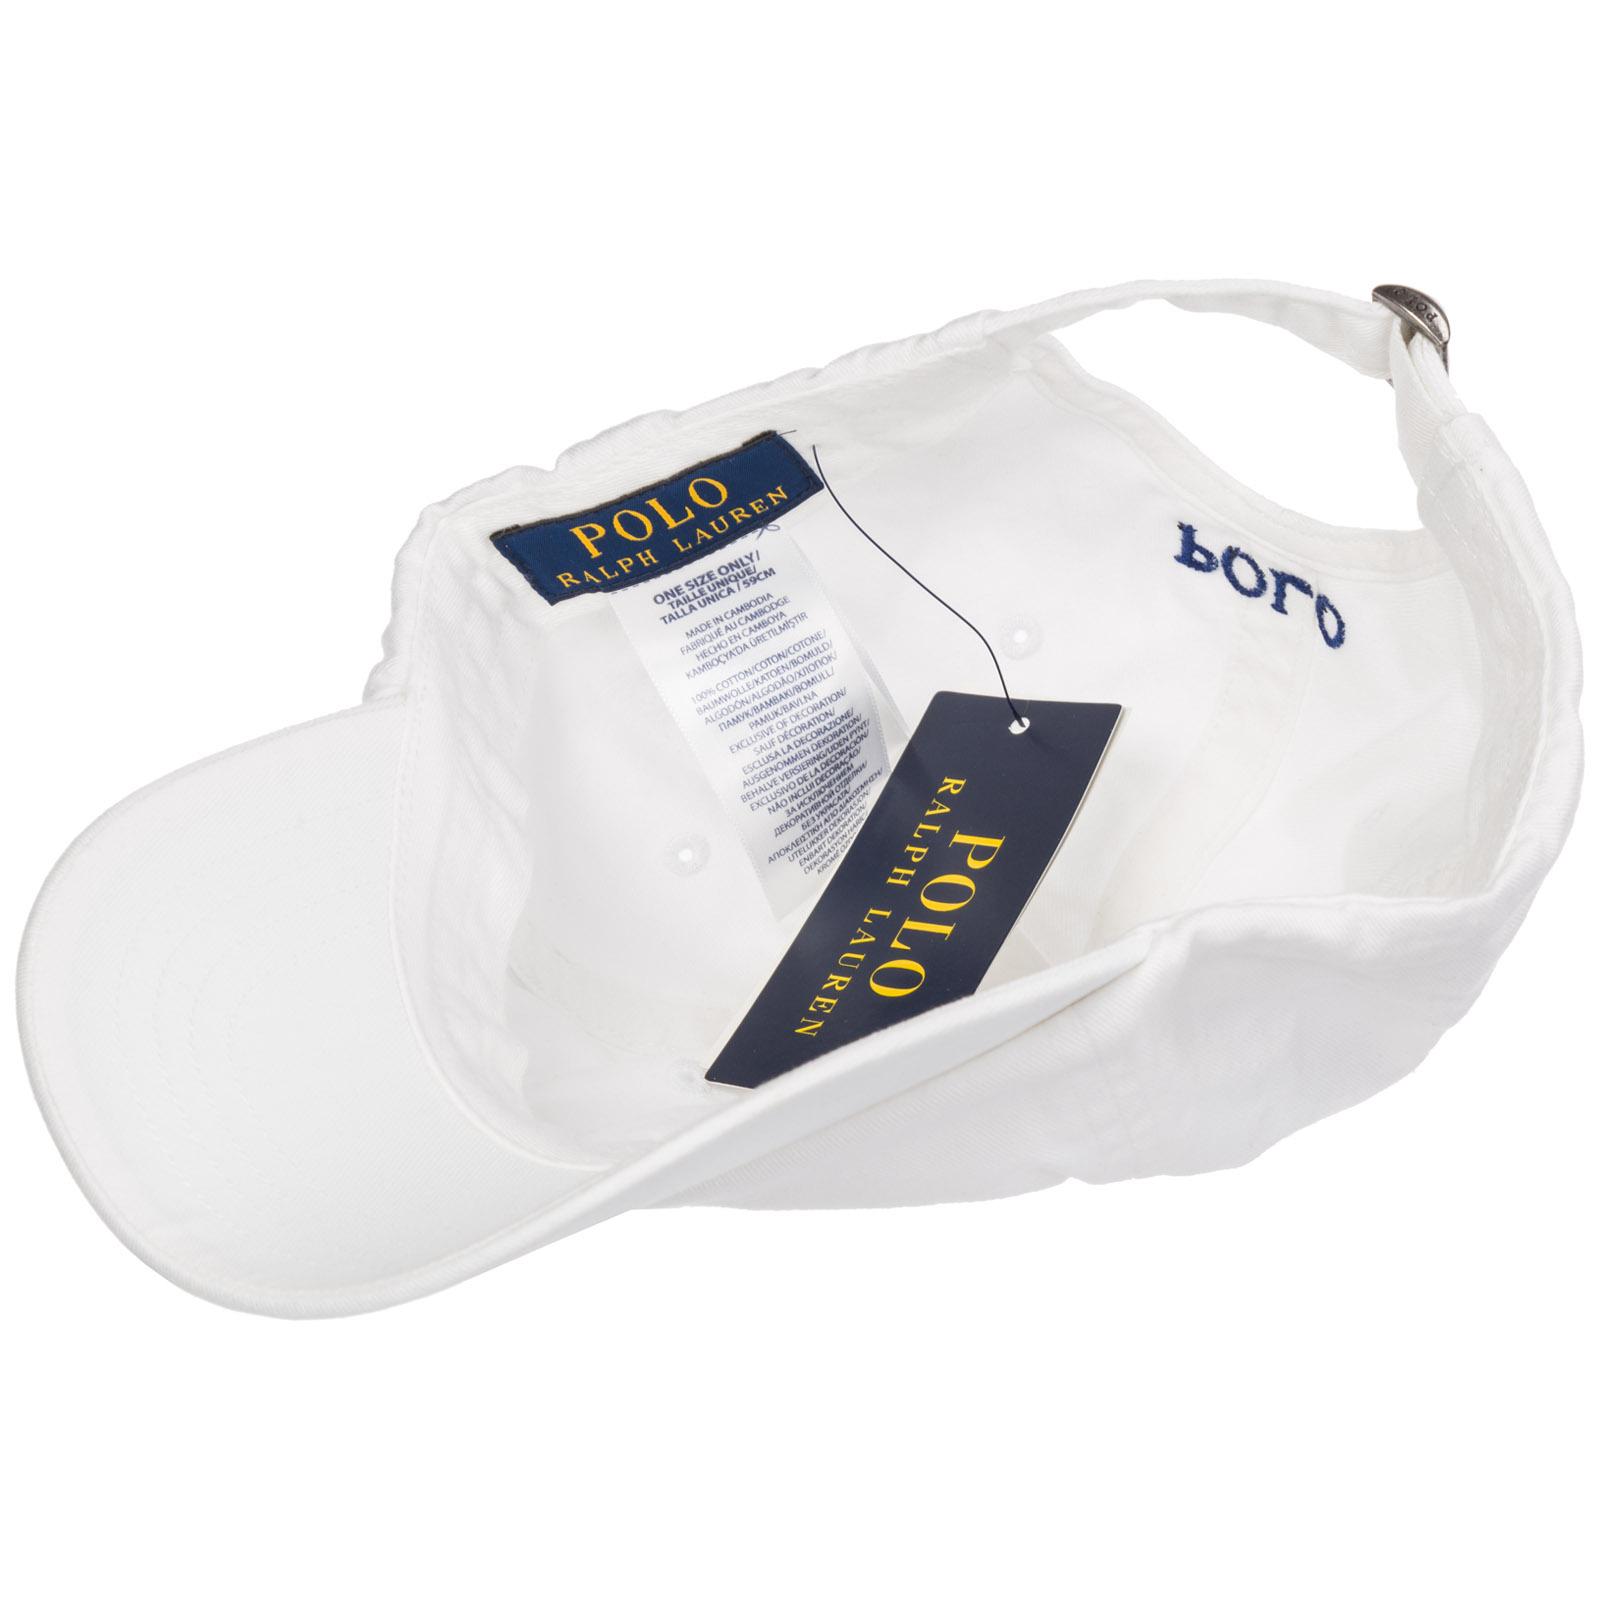 premium selection bb93f cc16c Cappello berretto regolabile uomo in cotone